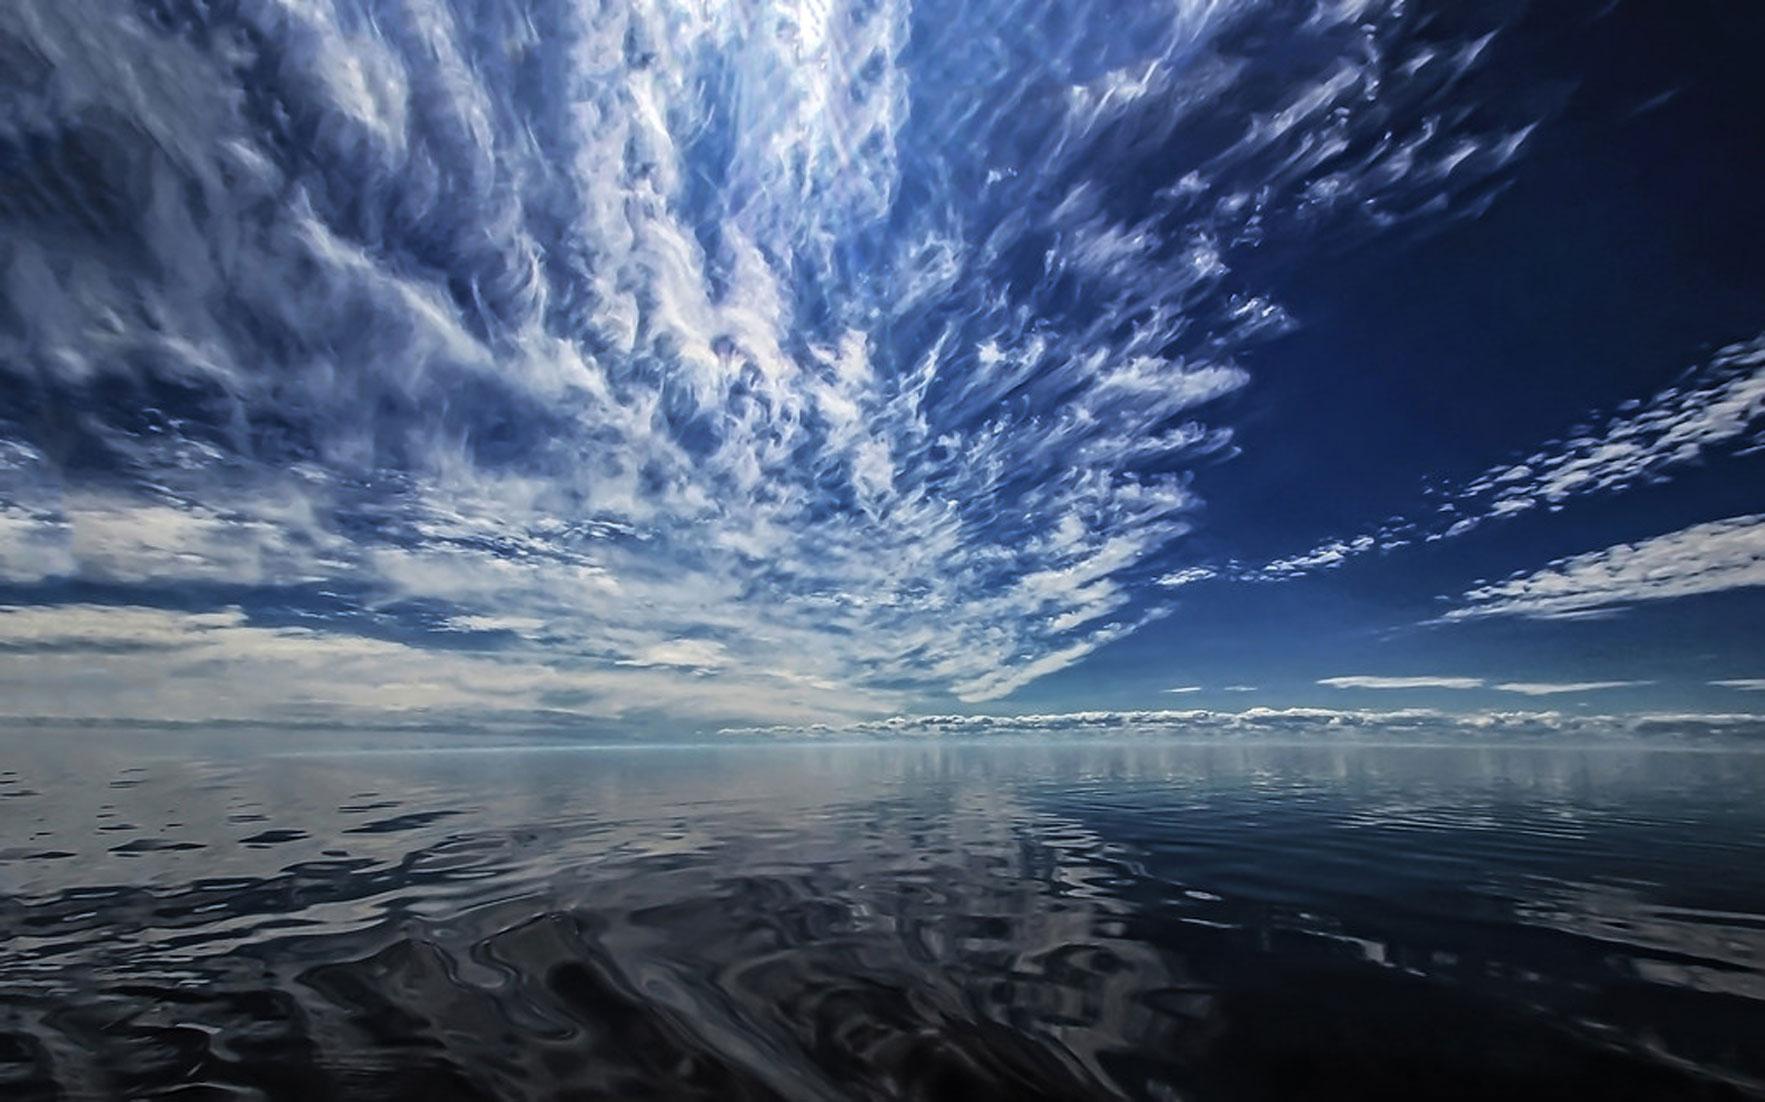 Картинки небо и воды